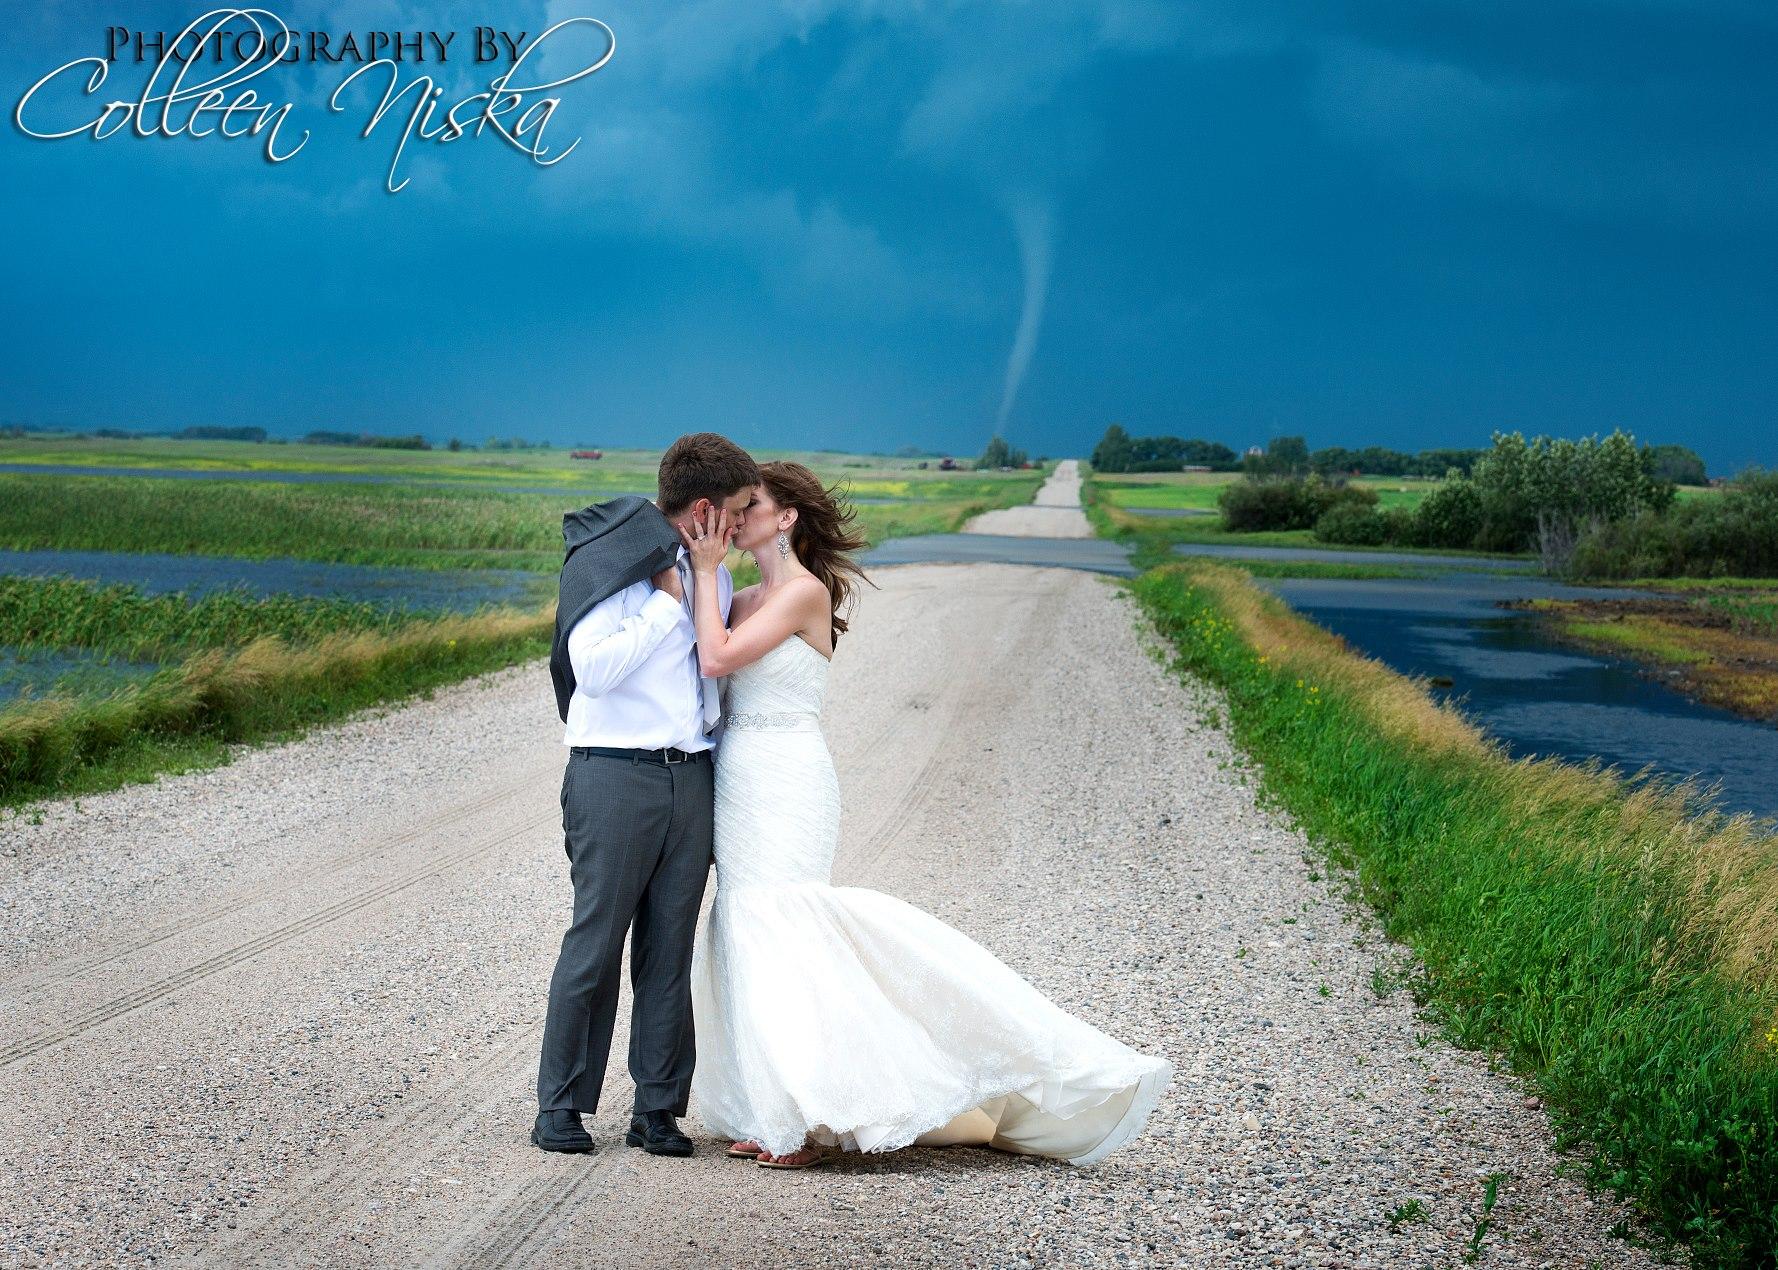 Colleen Niska Tornado Photo Canada